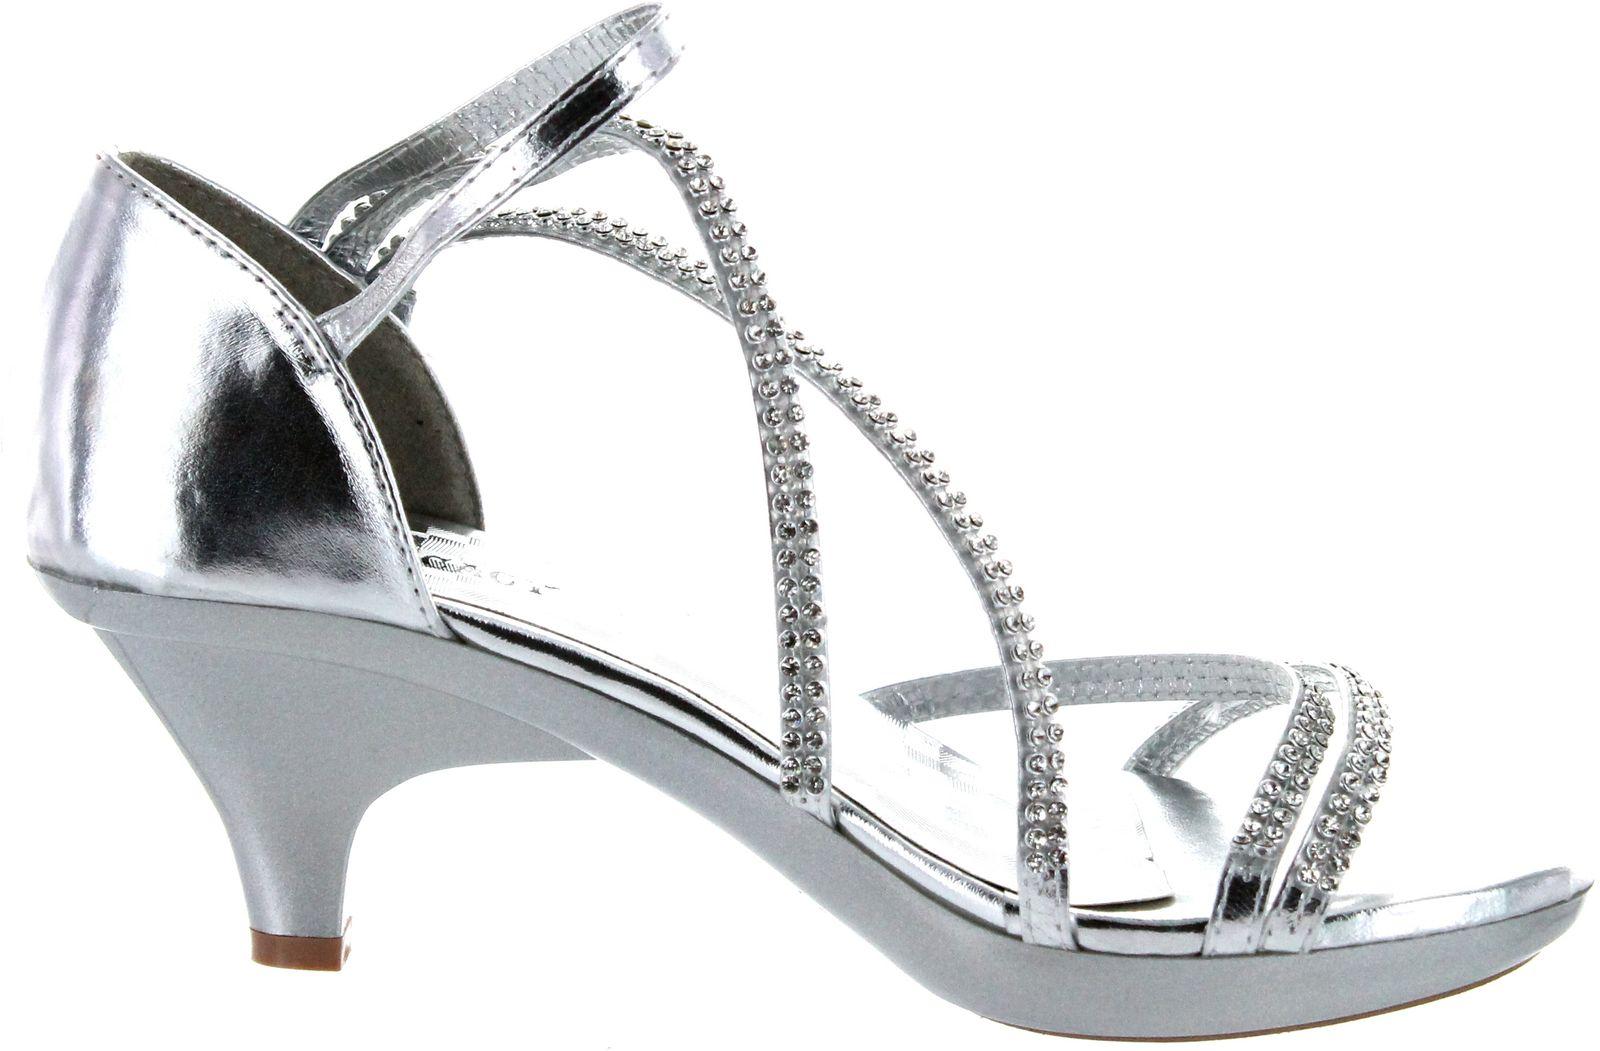 Delicacy Womens Angel-48 Party Dress Sandals Pumps